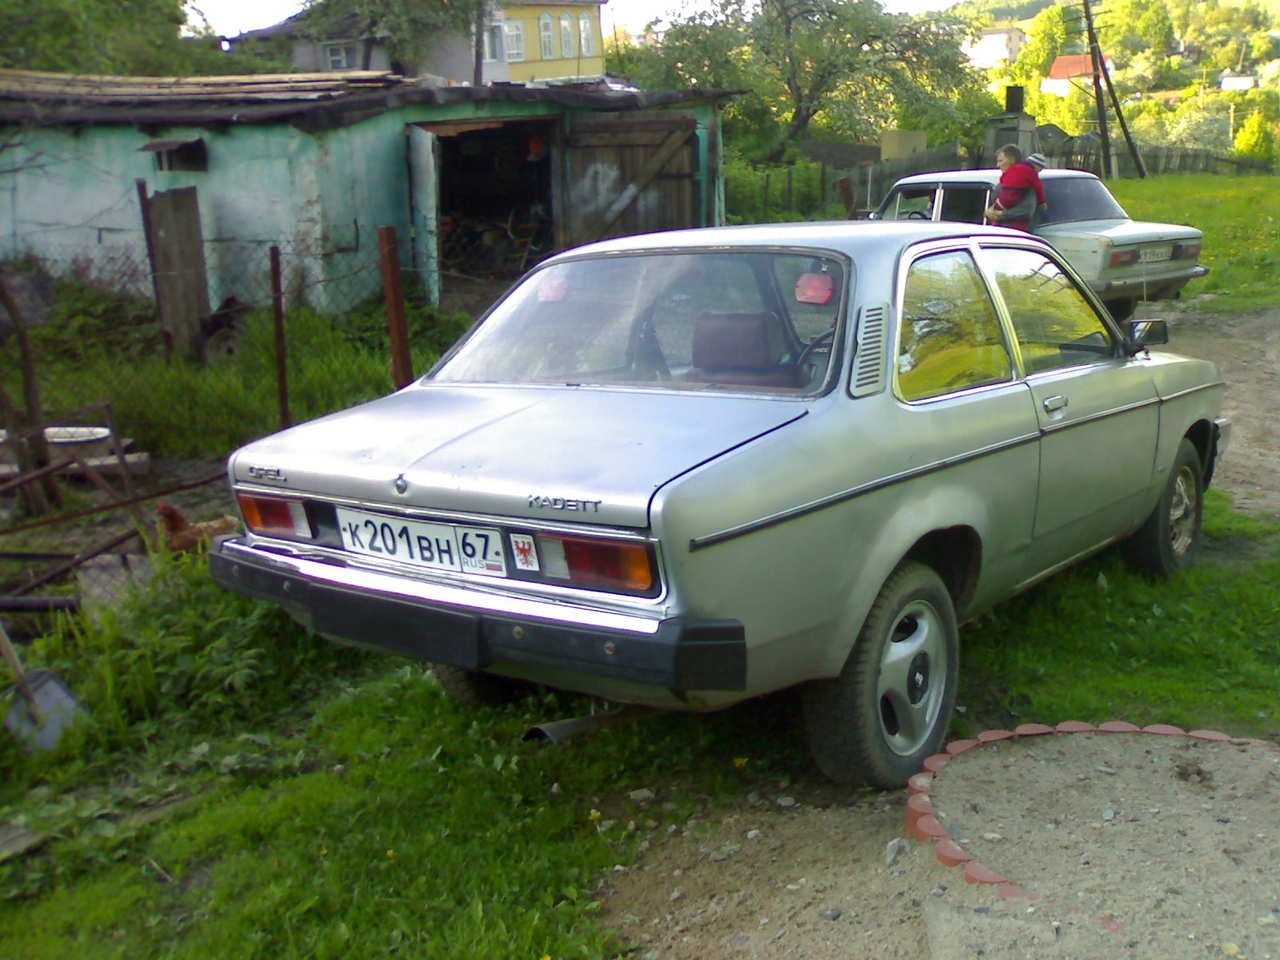 Used 1979 opel kadett photos 1200cc gasoline fr or rr for Opel kadett e interieur